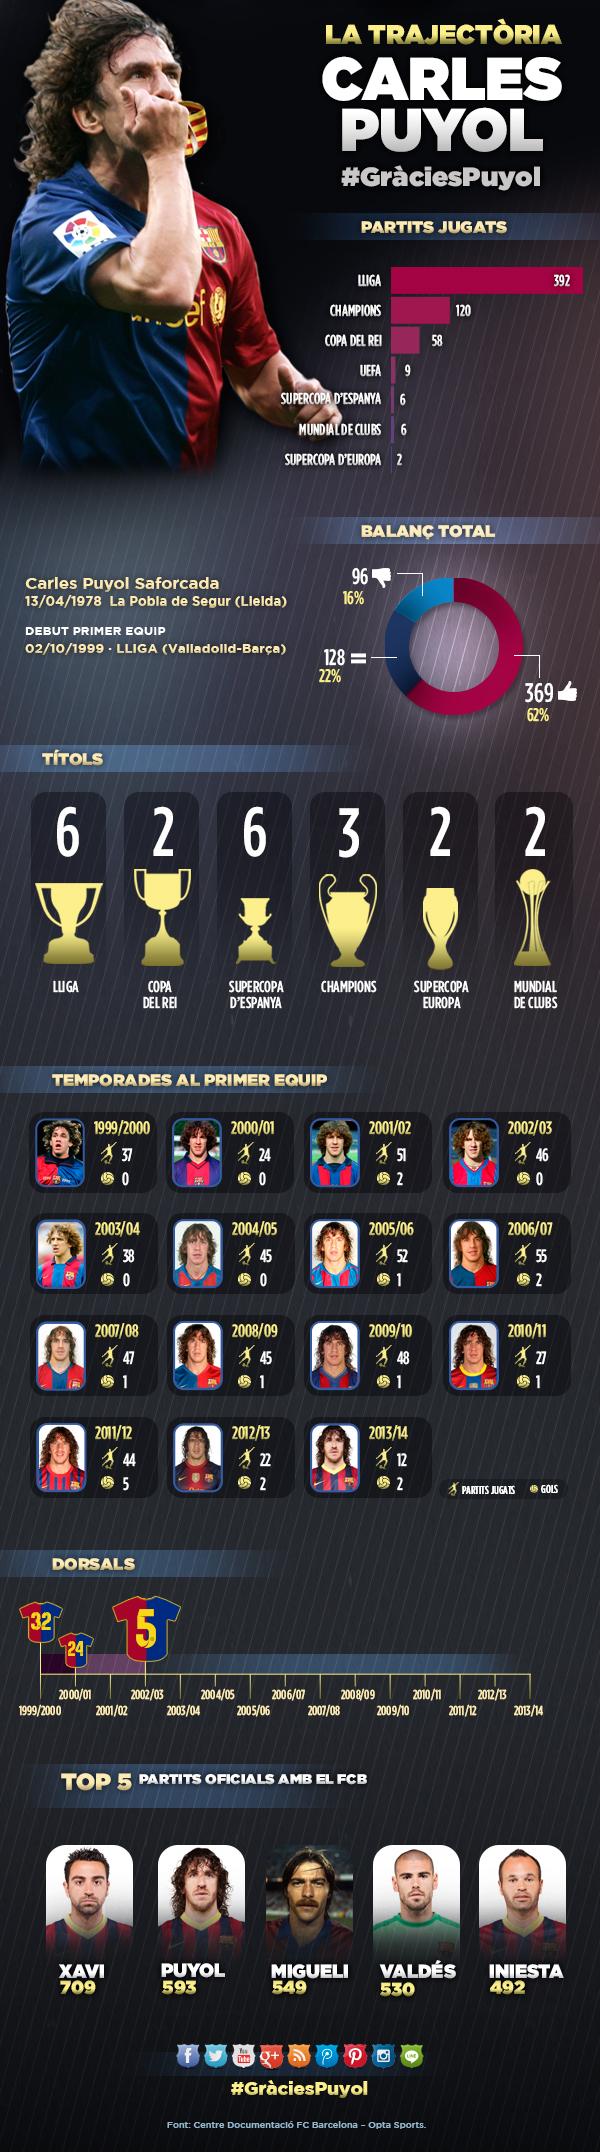 Infogràfic Carles Puyol